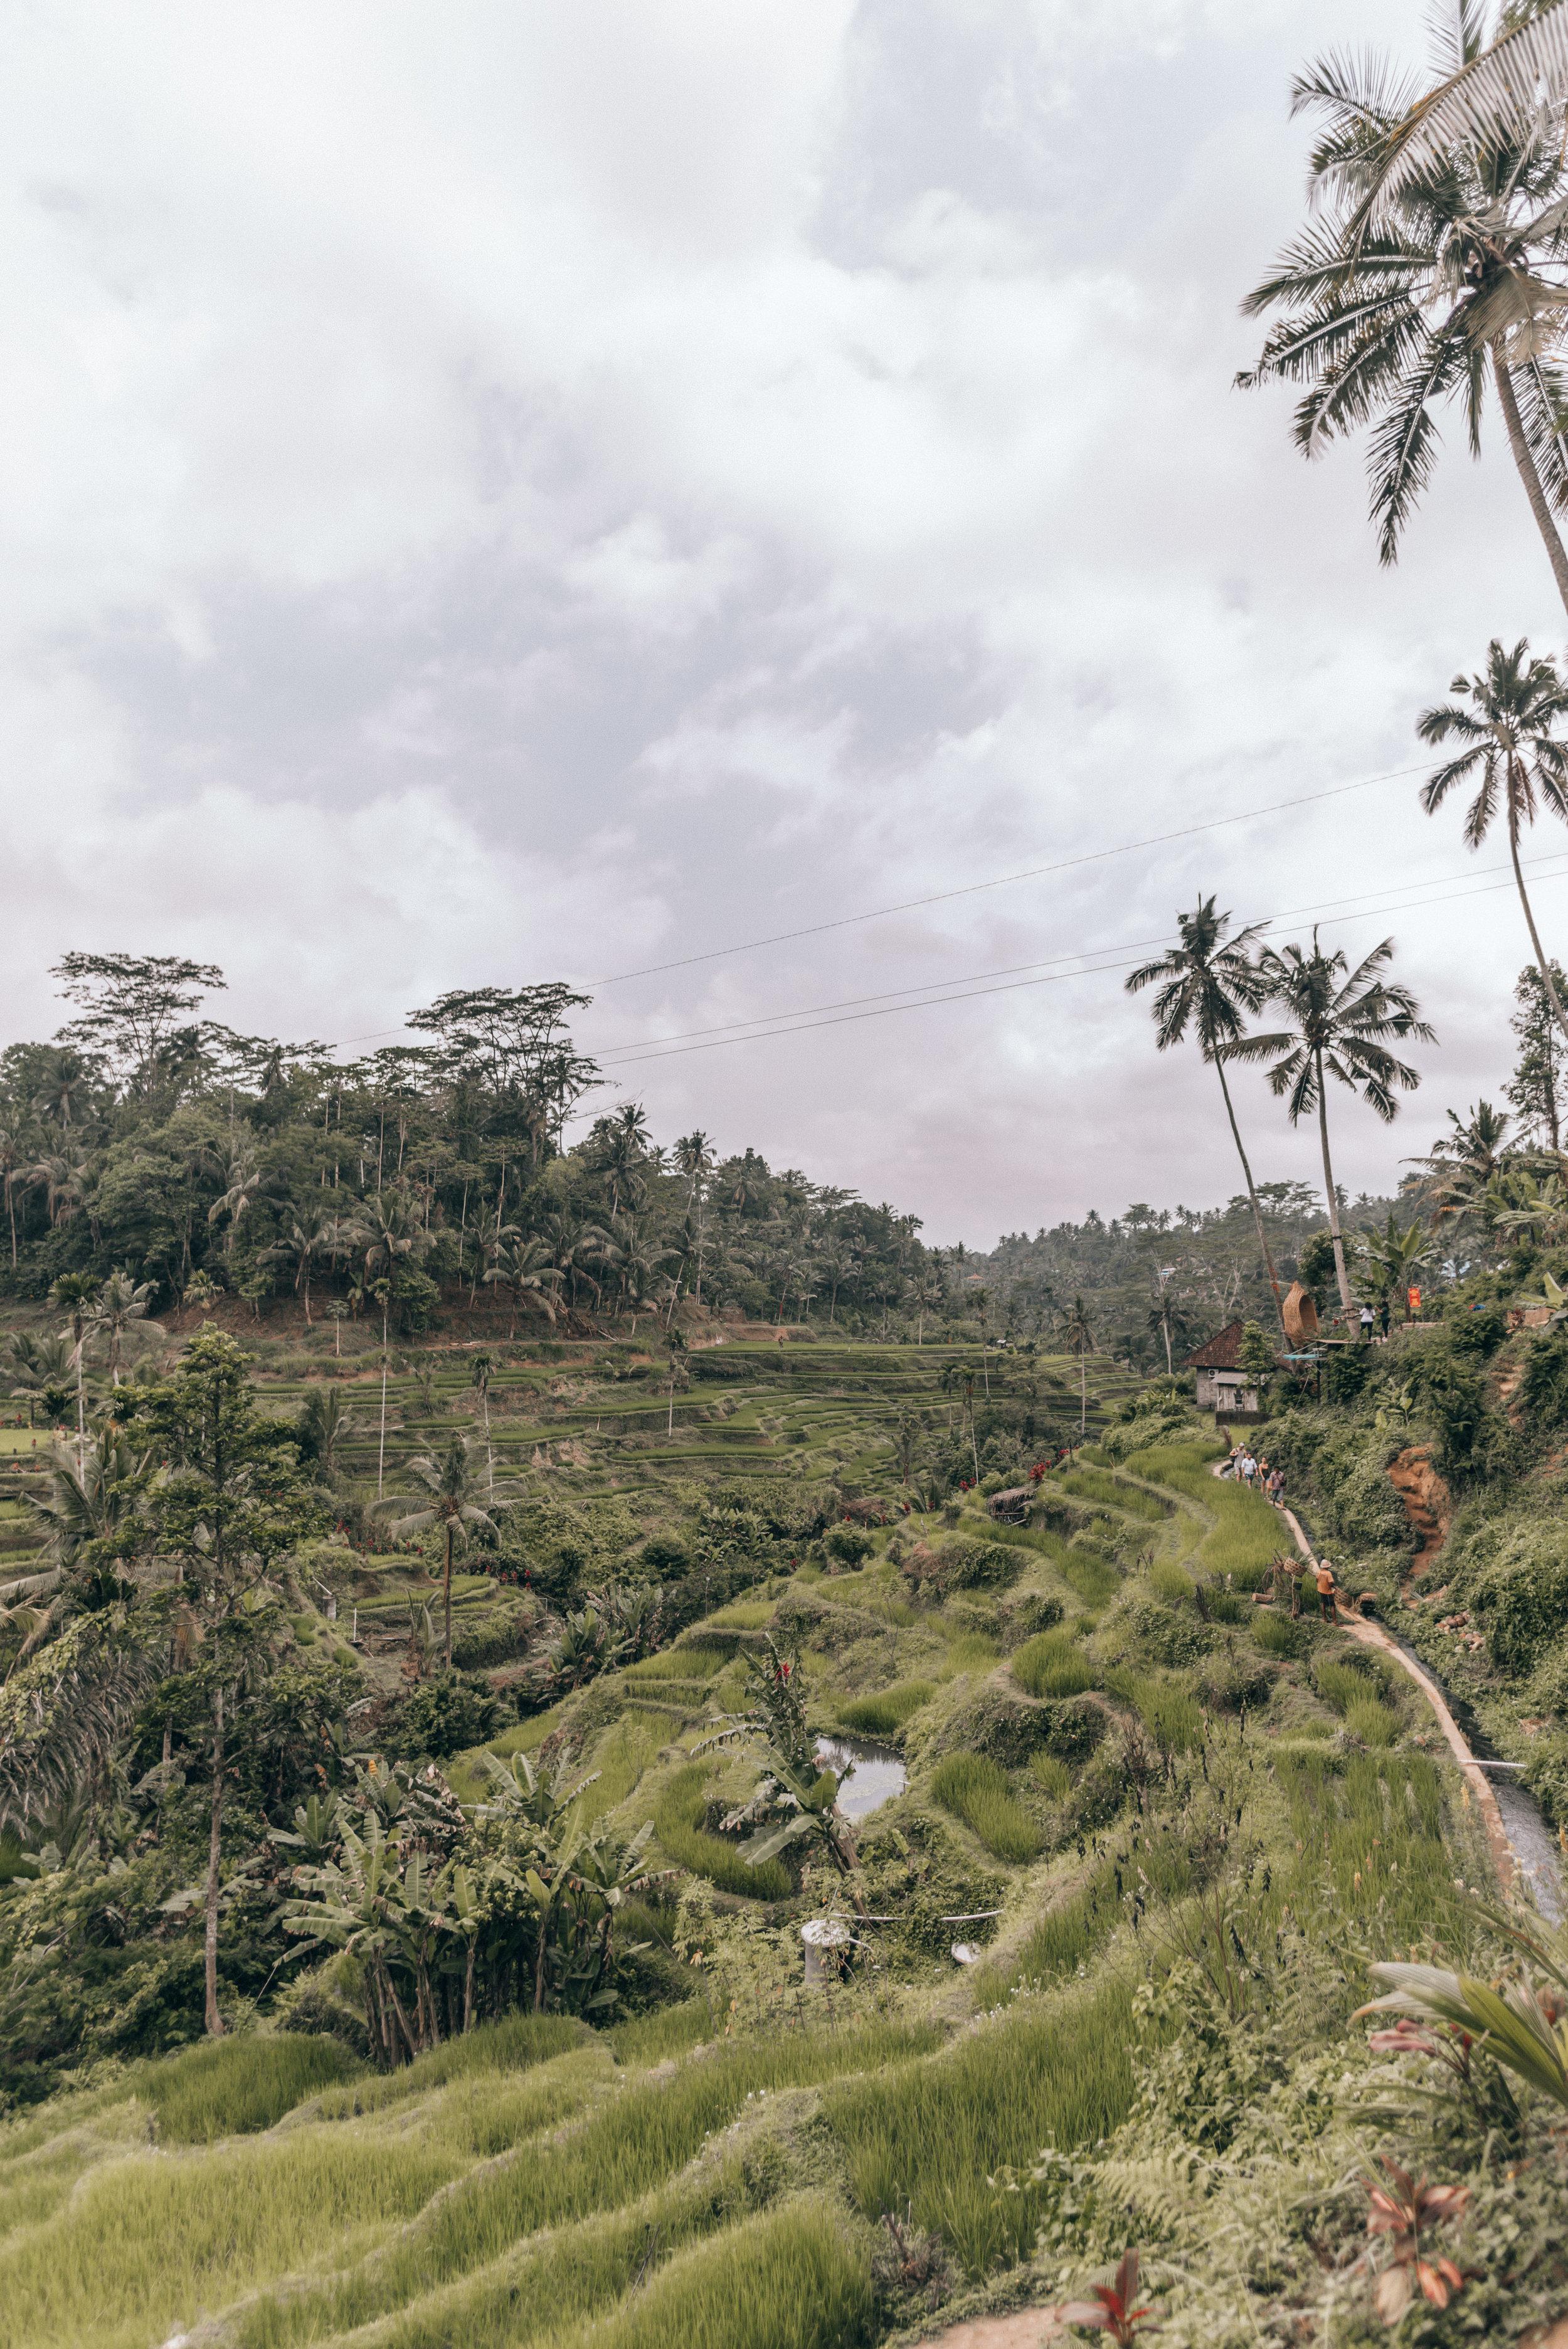 tegalalang-rice-terrace-by-lisa-linh